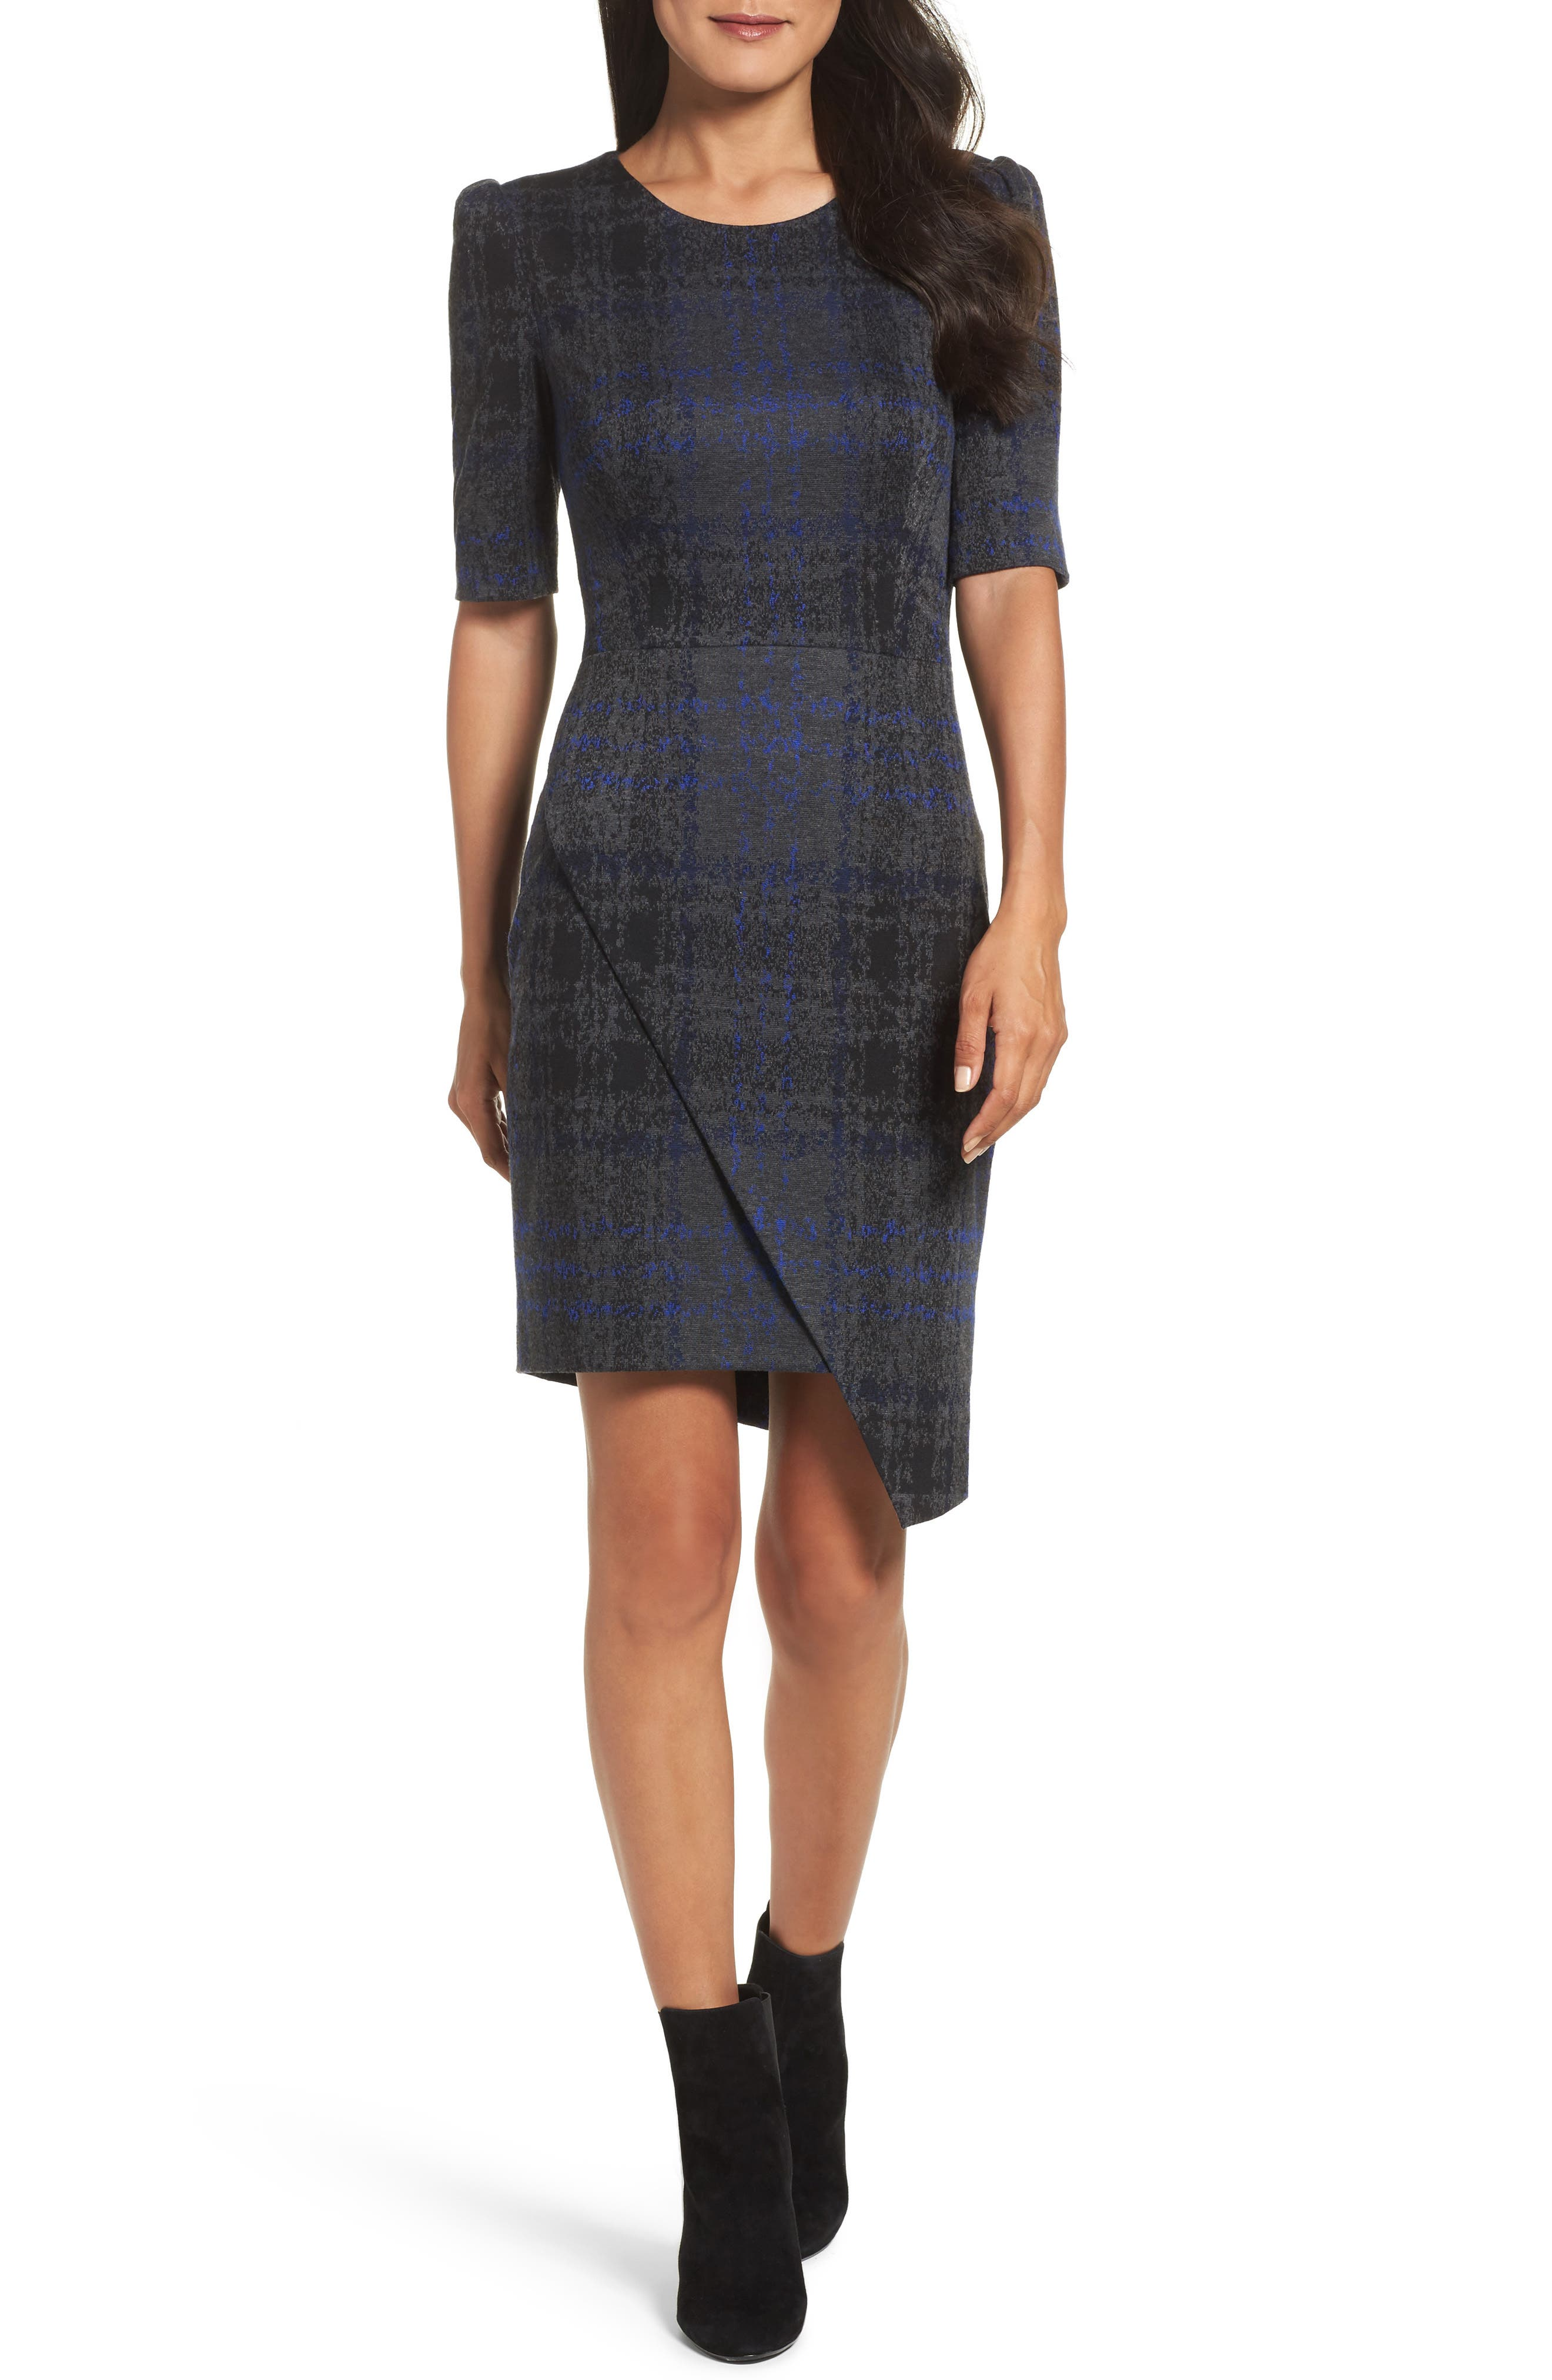 Betsey Johnson Asymmetrical Dress